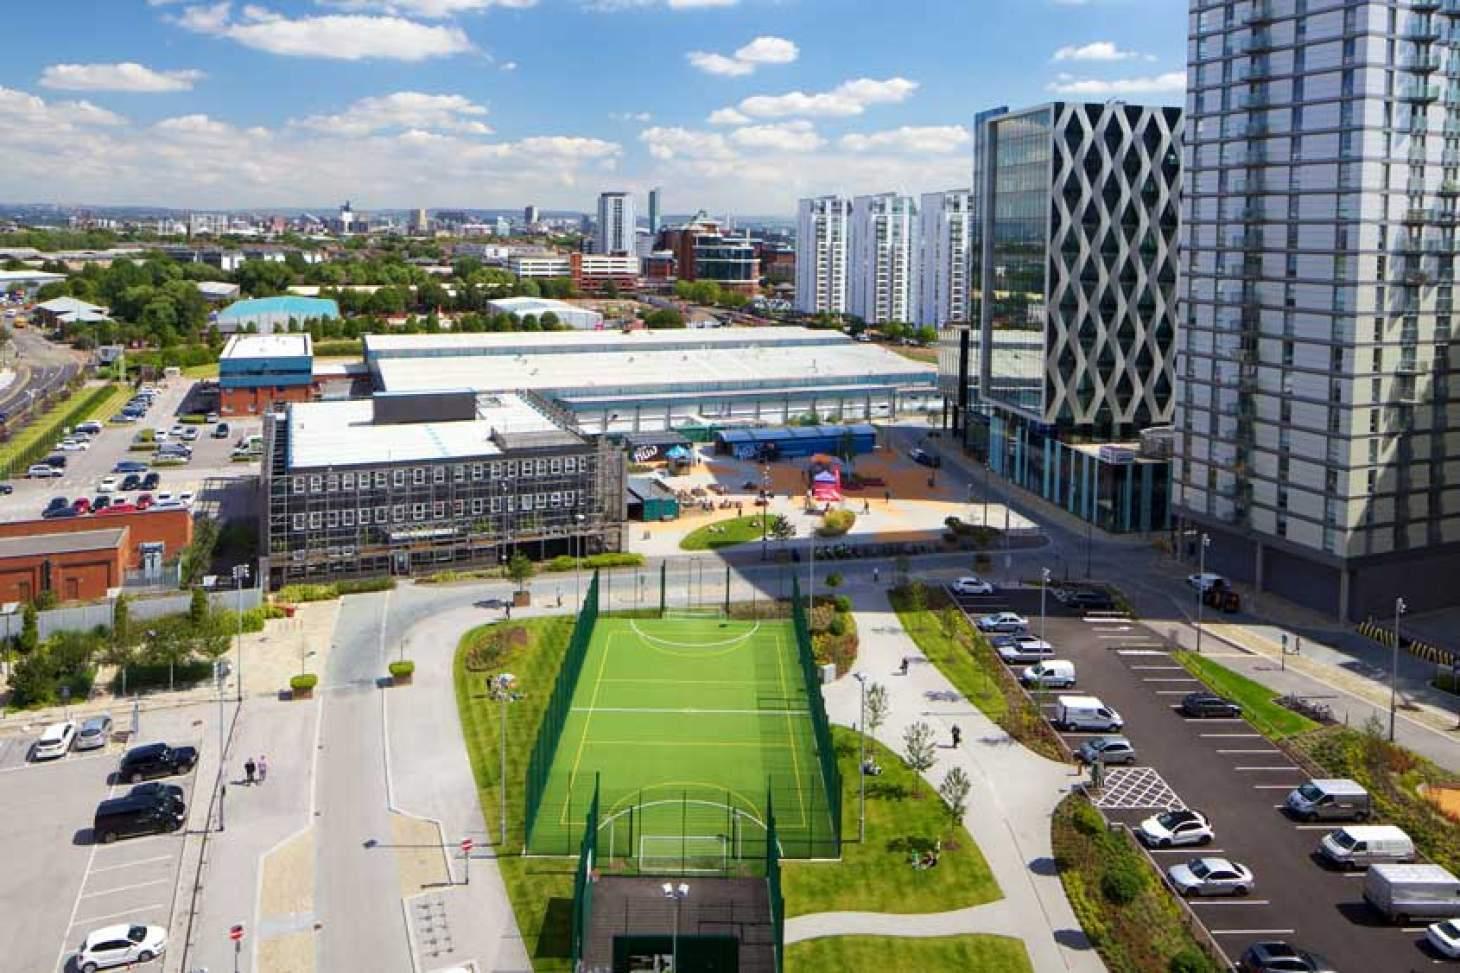 The Pitch - MediaCityUK Outdoor   3G Astroturf netball court